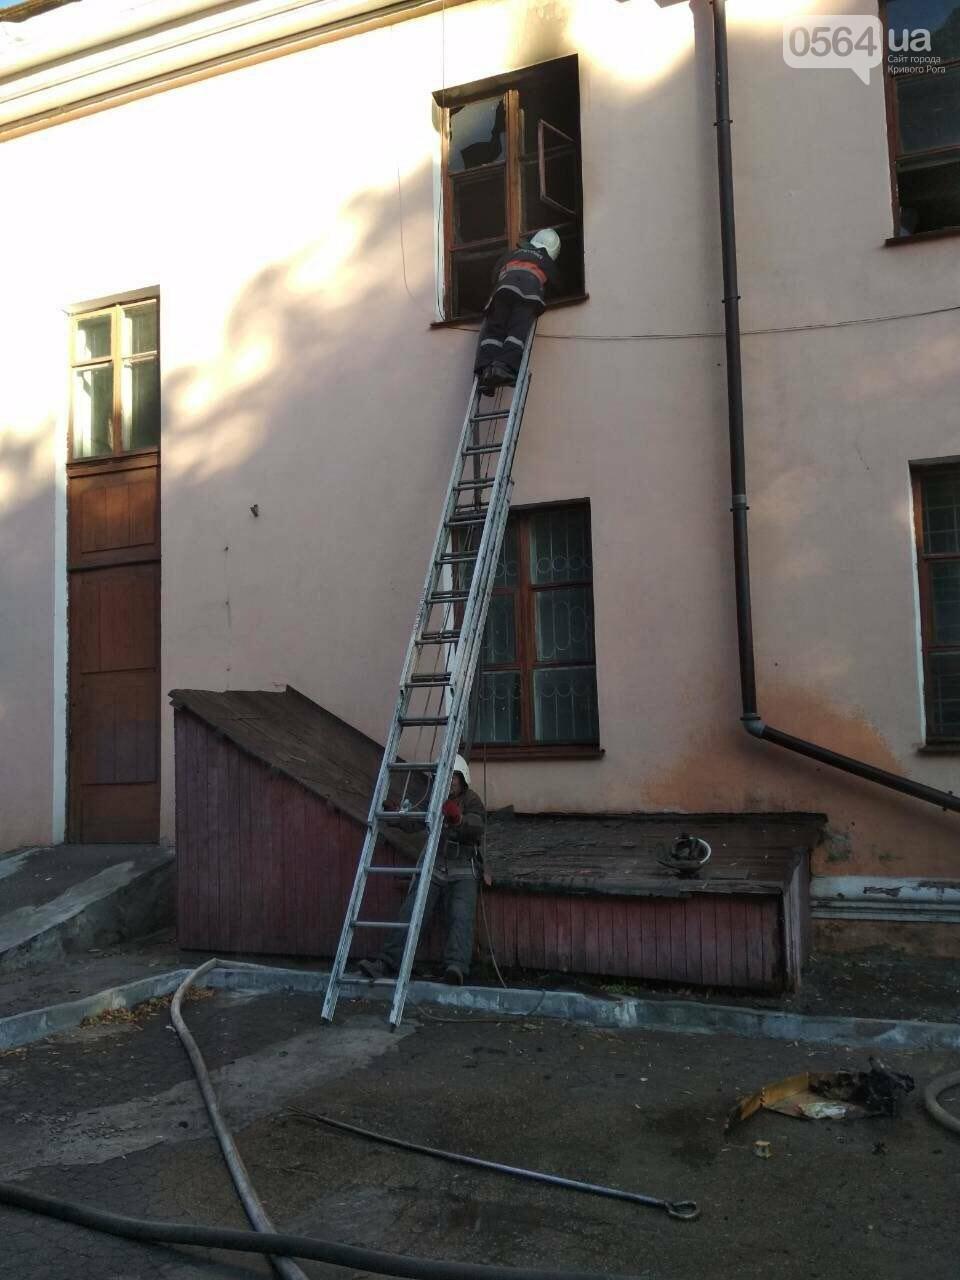 В Кривом Роге на пожаре в здании ДК погиб мужчина, - ФОТО , фото-4